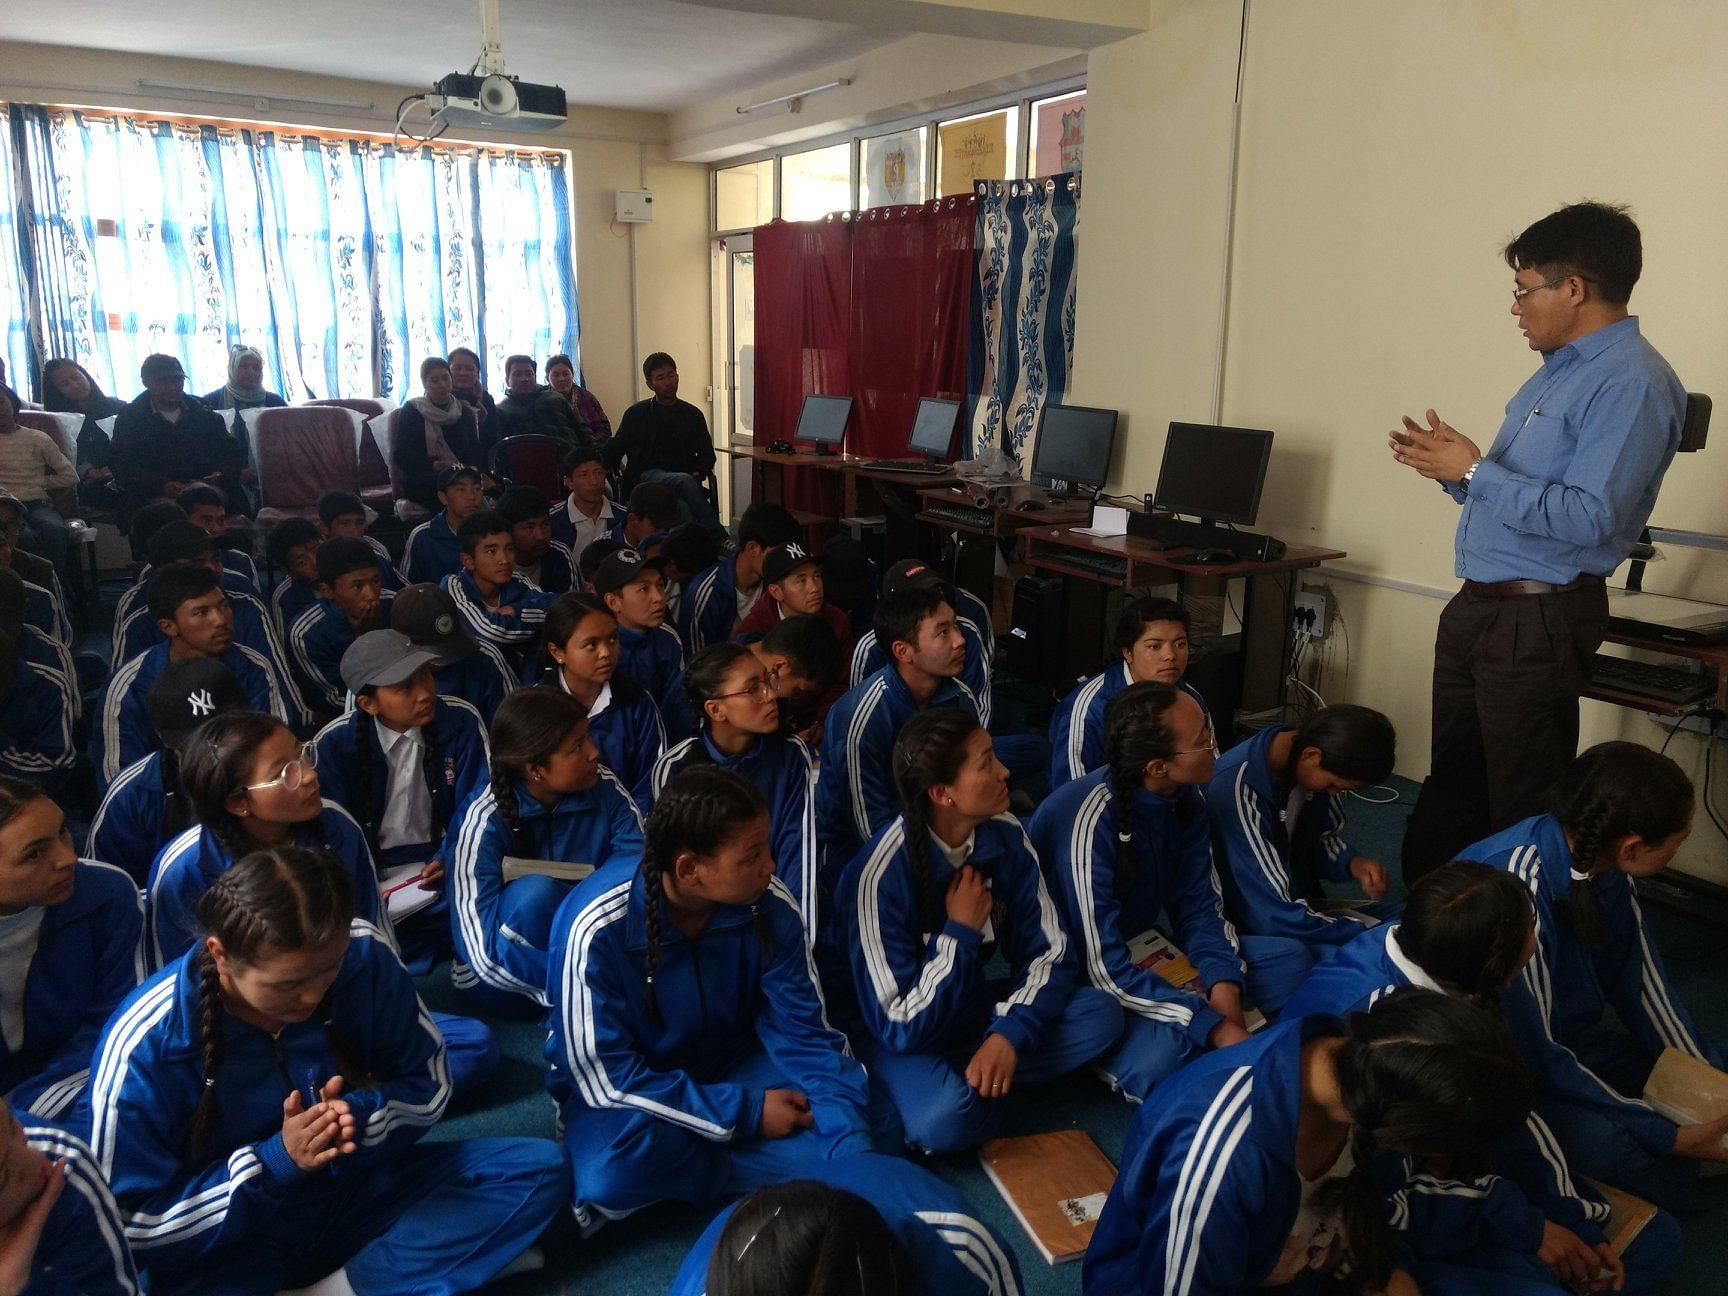 Tsering Tashi addressing students. (Source: Ladakh Science Foundation)